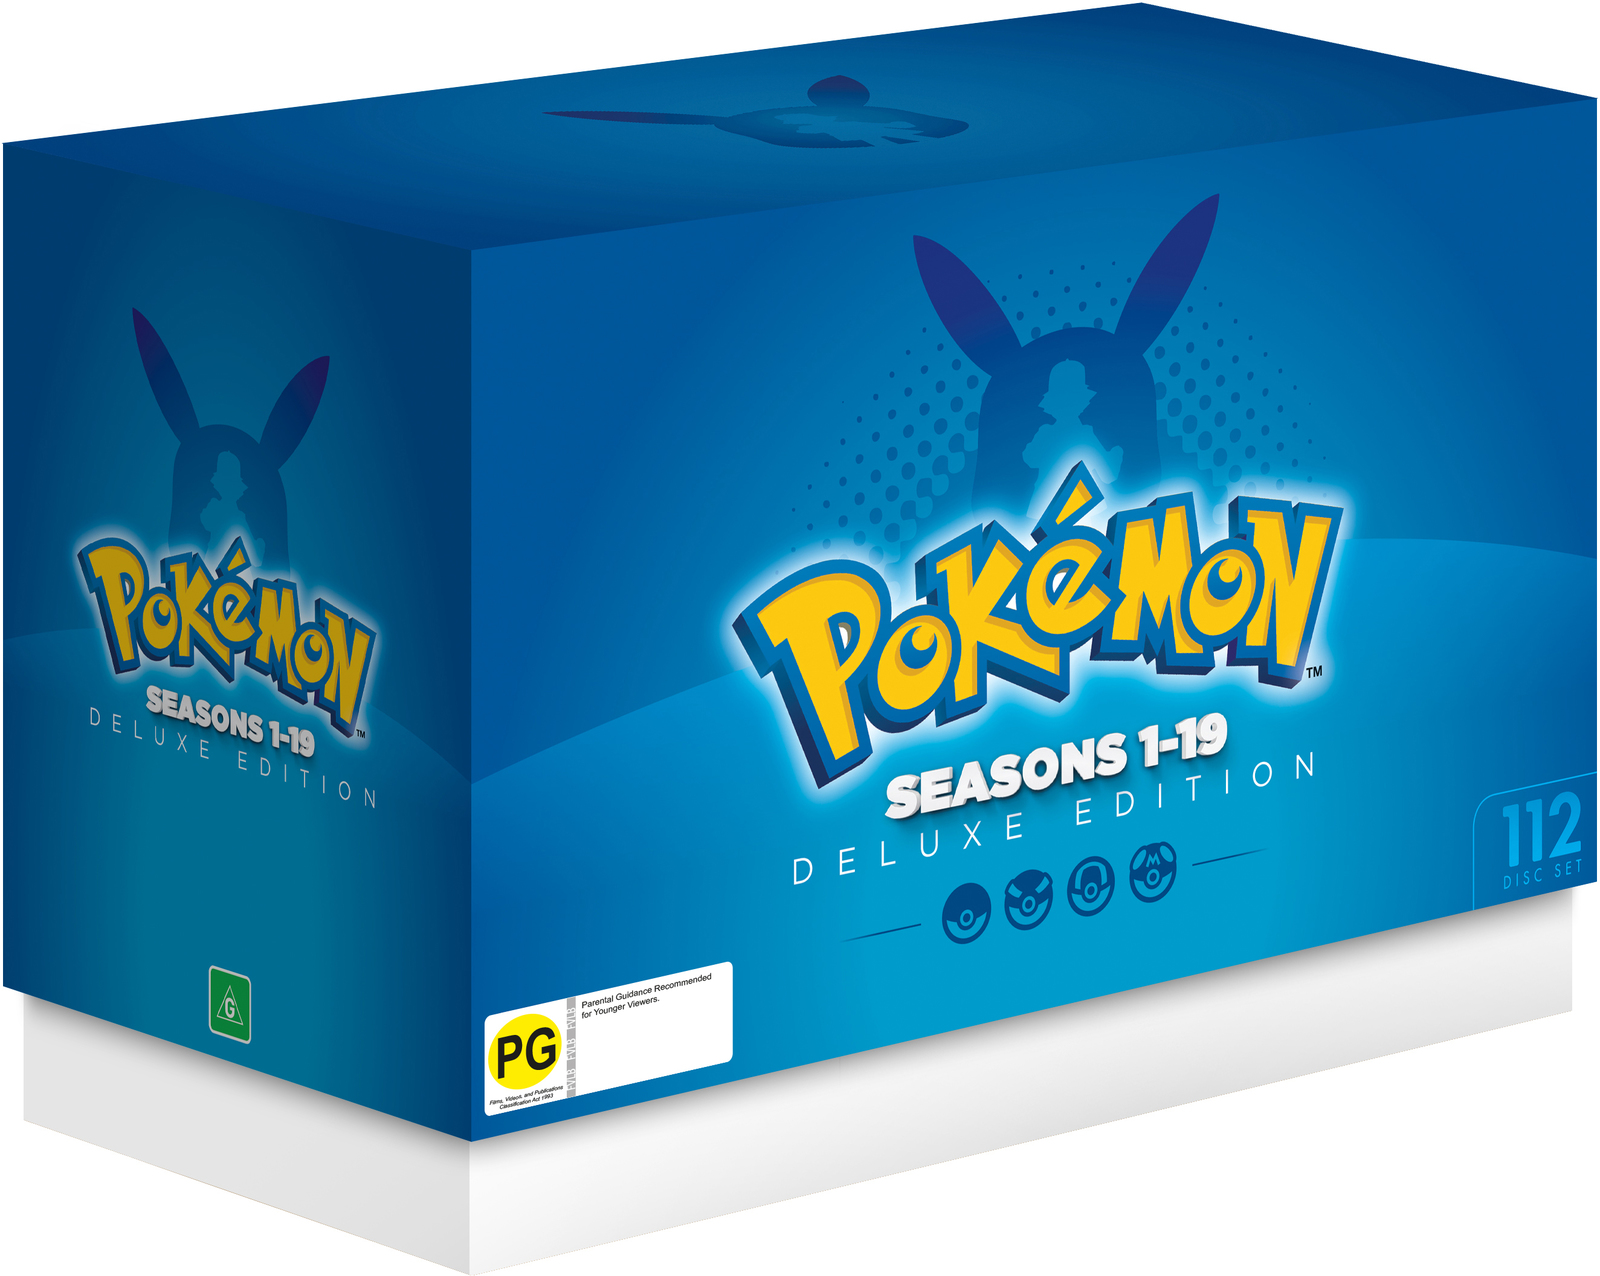 Pokemon - Deluxe Edition (Seasons 1-19) on DVD image